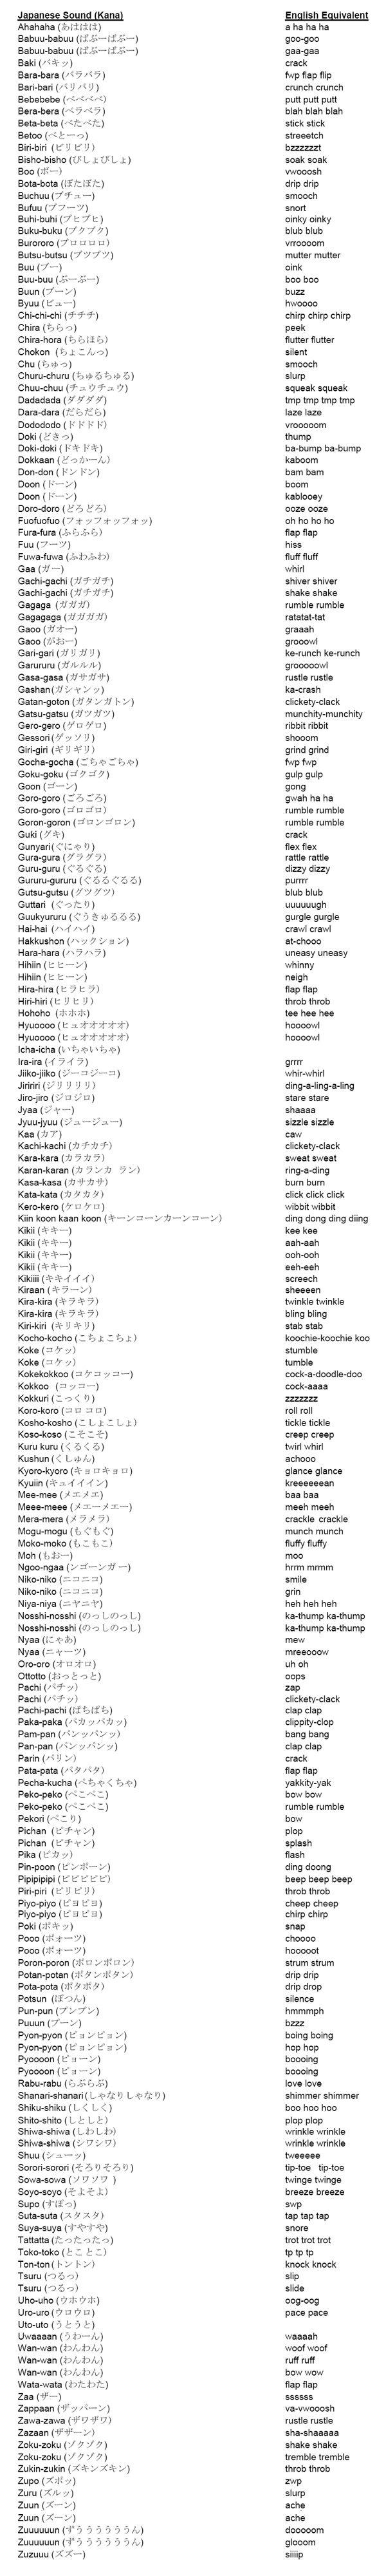 The Great Big Japanese SFX List from www.mangatutorials.com.